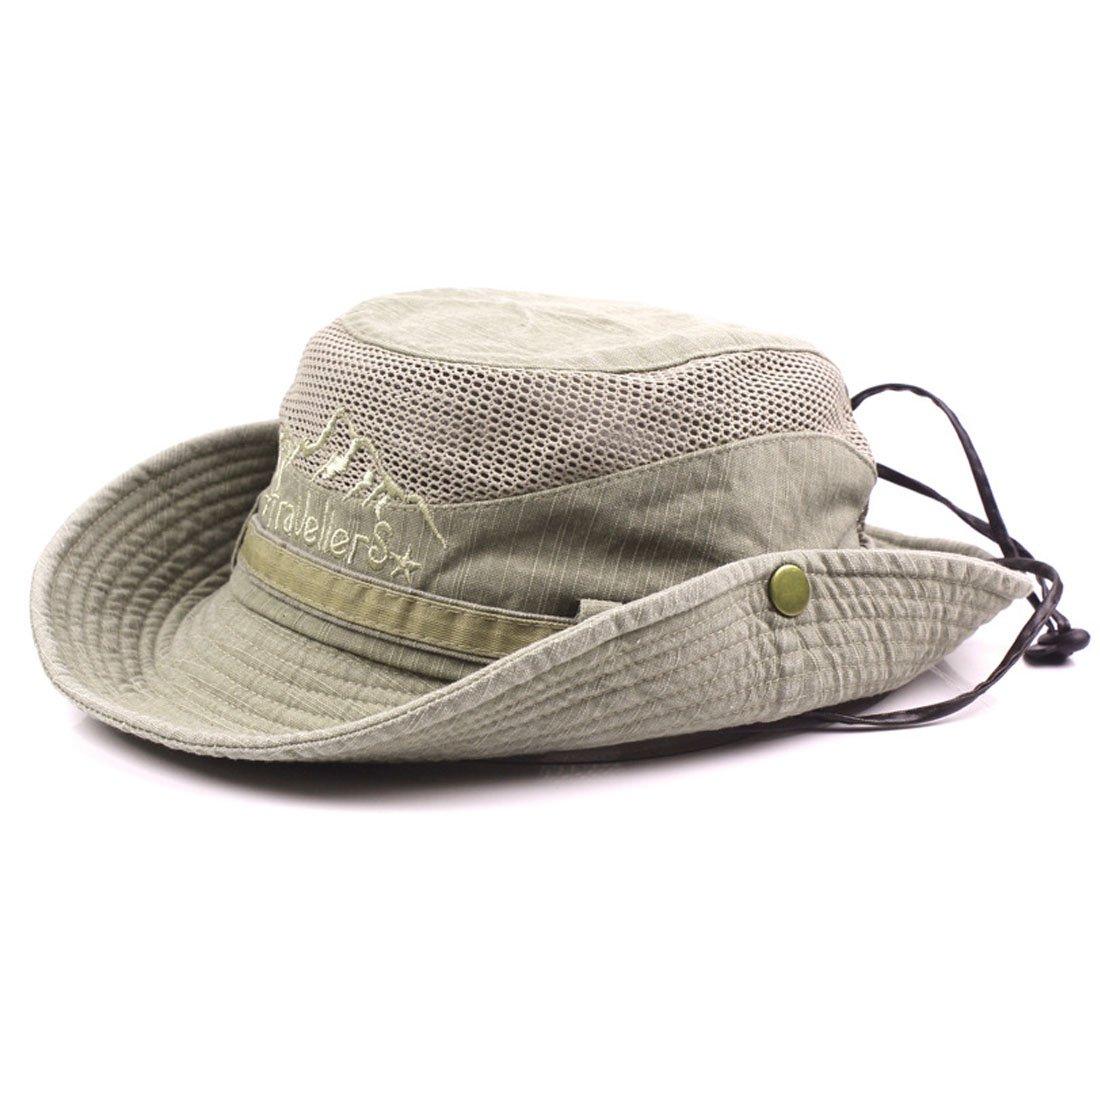 King Star Men Summer Cotton Cowboy Sun Hat Wide Brim Bucket Fishing Hats H614242-1